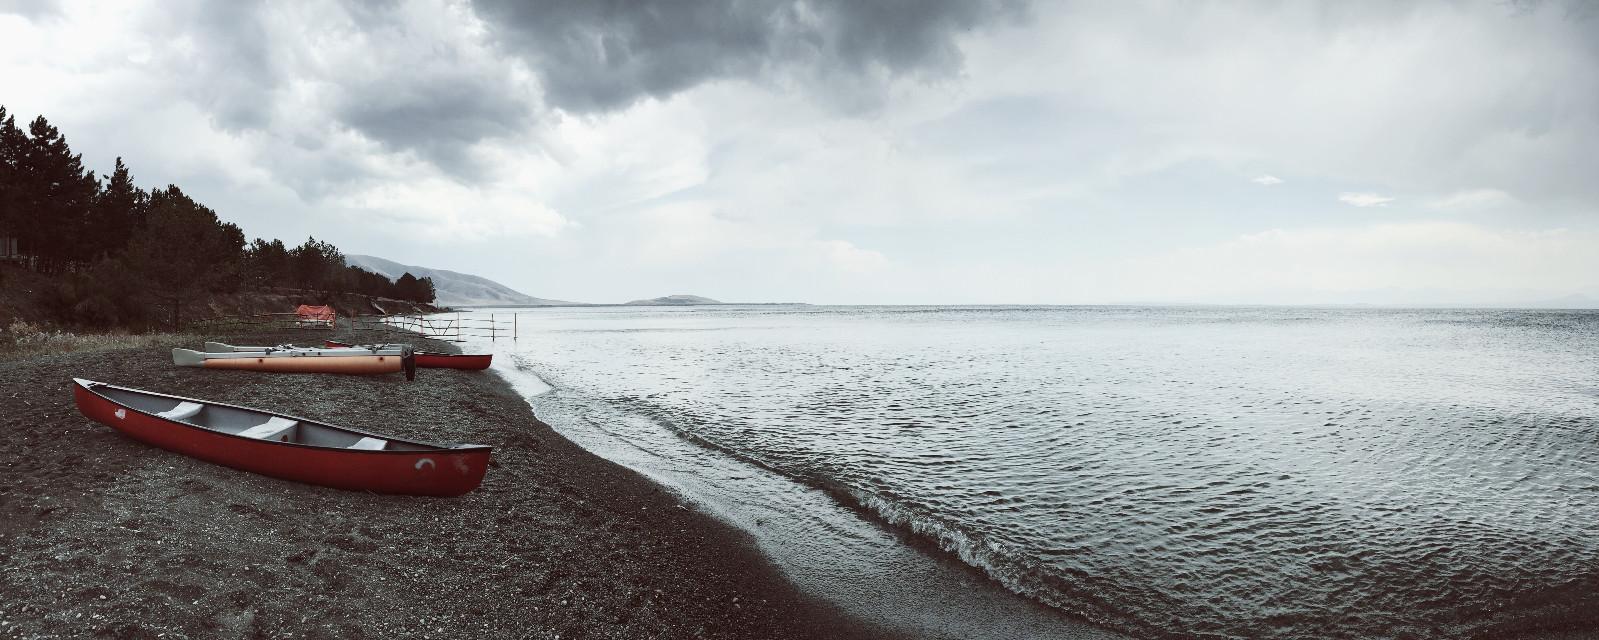 #seaside  #sea  #beach  #nature  #sky  #clouds